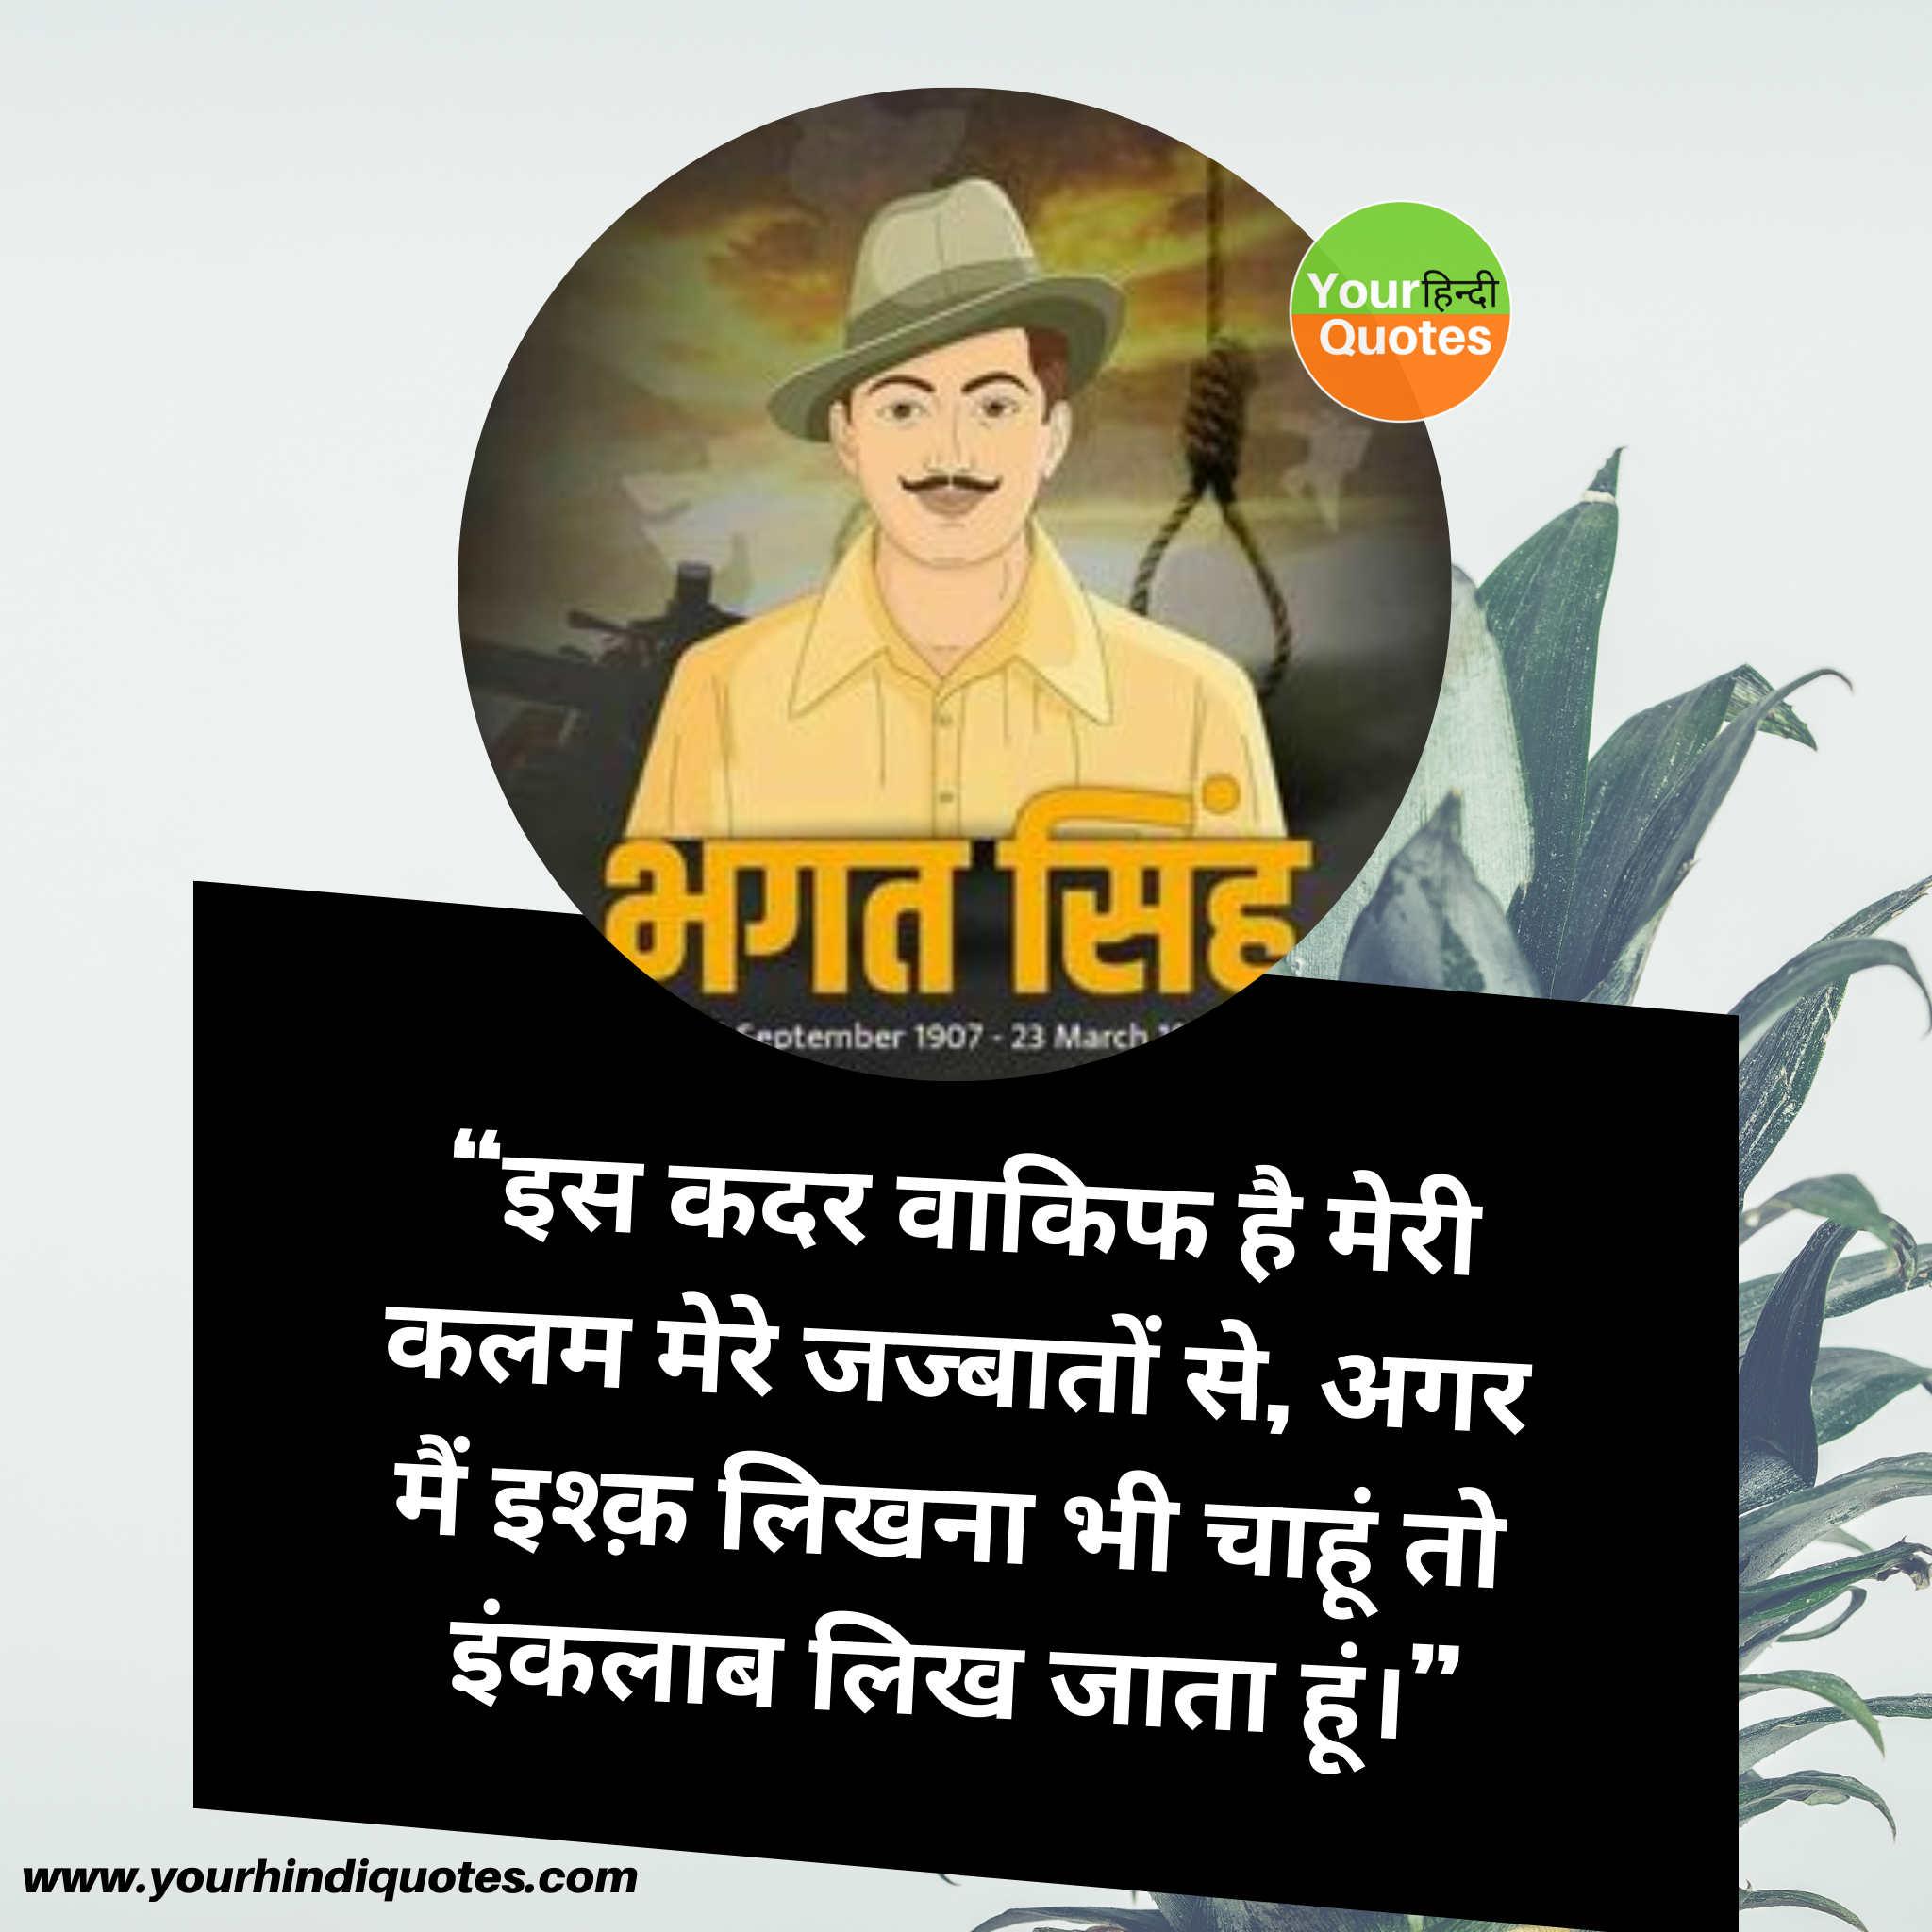 Bhagat Singh Hindi Quotes Image